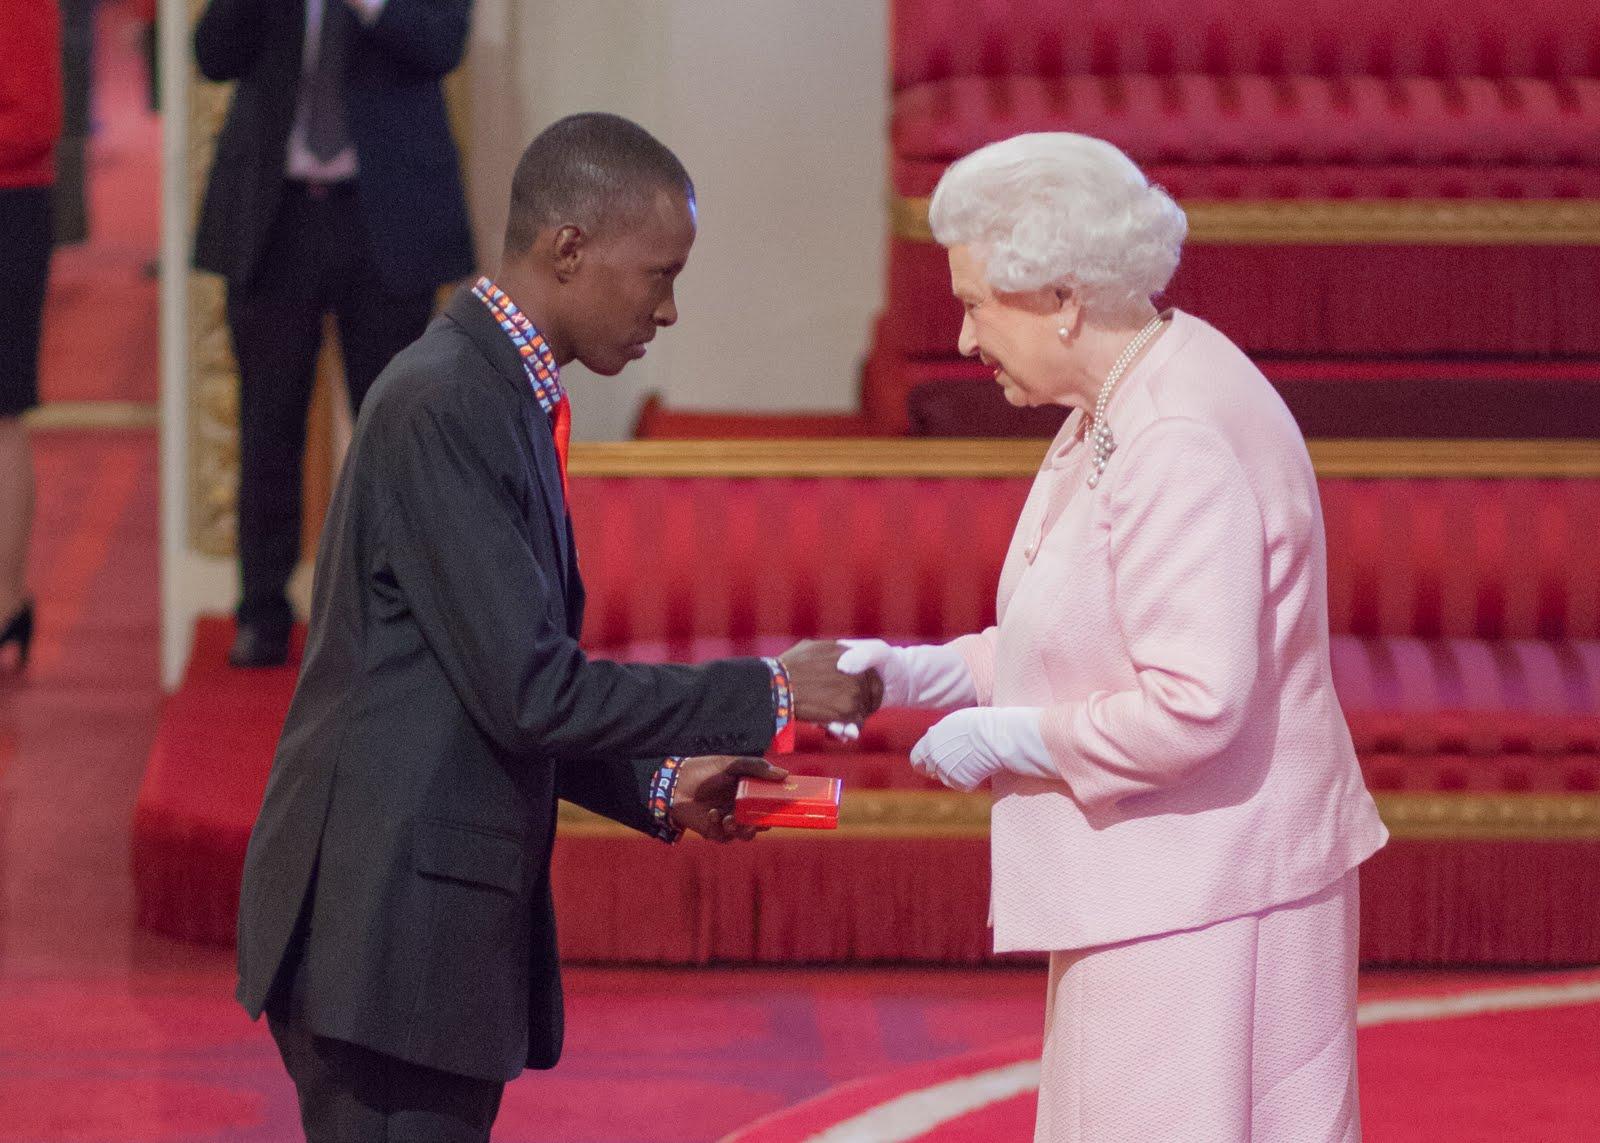 Abdikadir Aden Hassan - Kenya